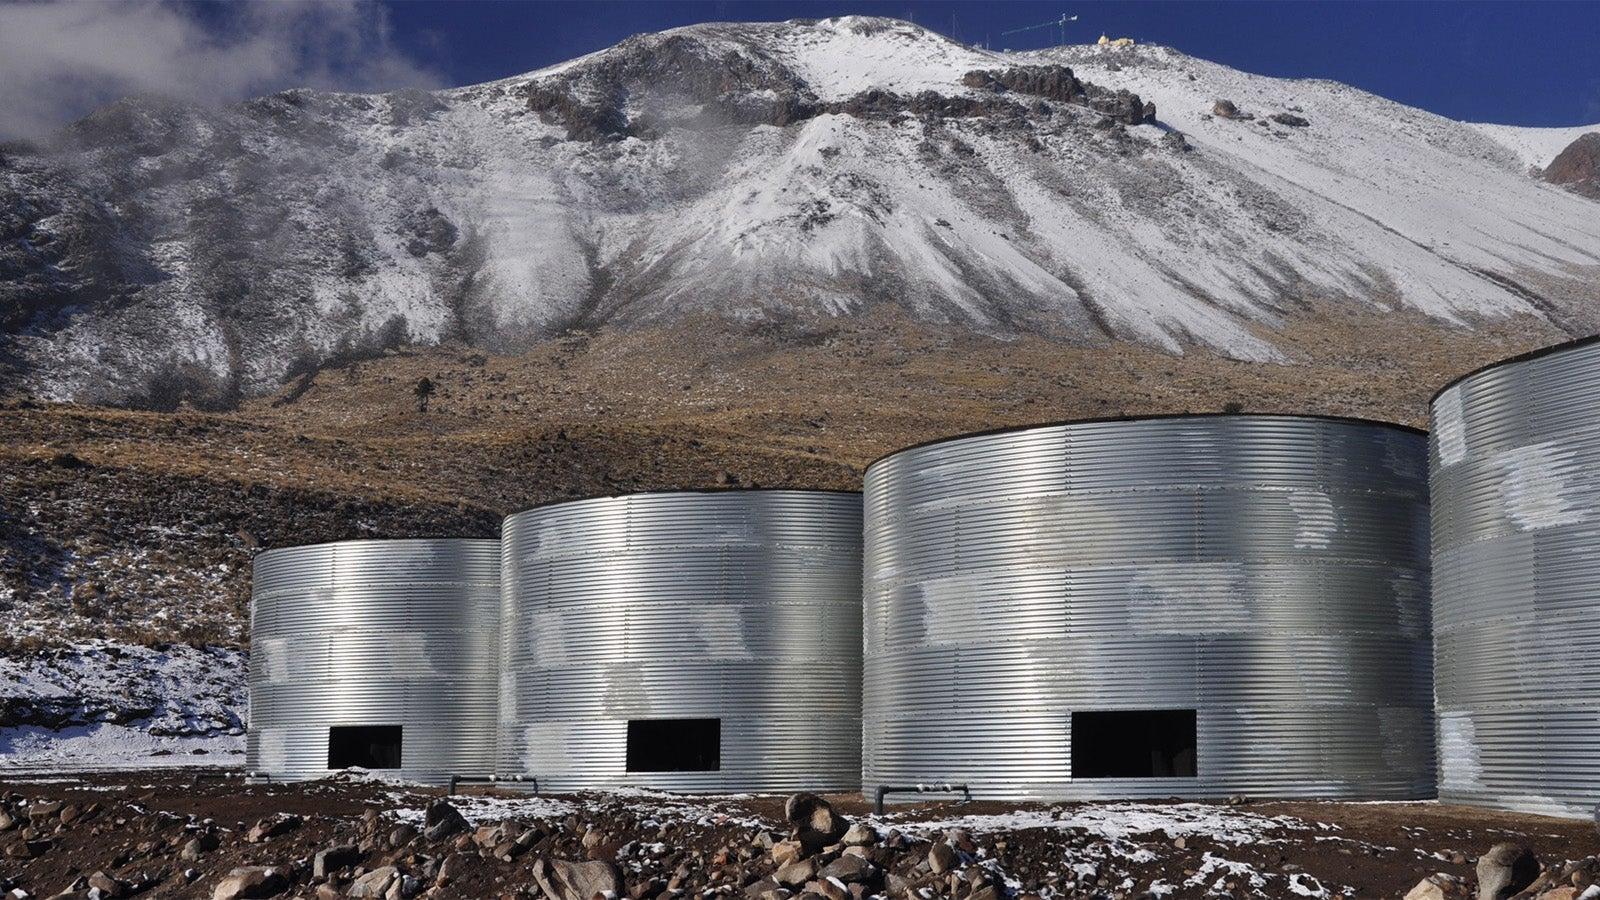 These Huge Beer Keg Tanks Will Study Cosmic Explosions